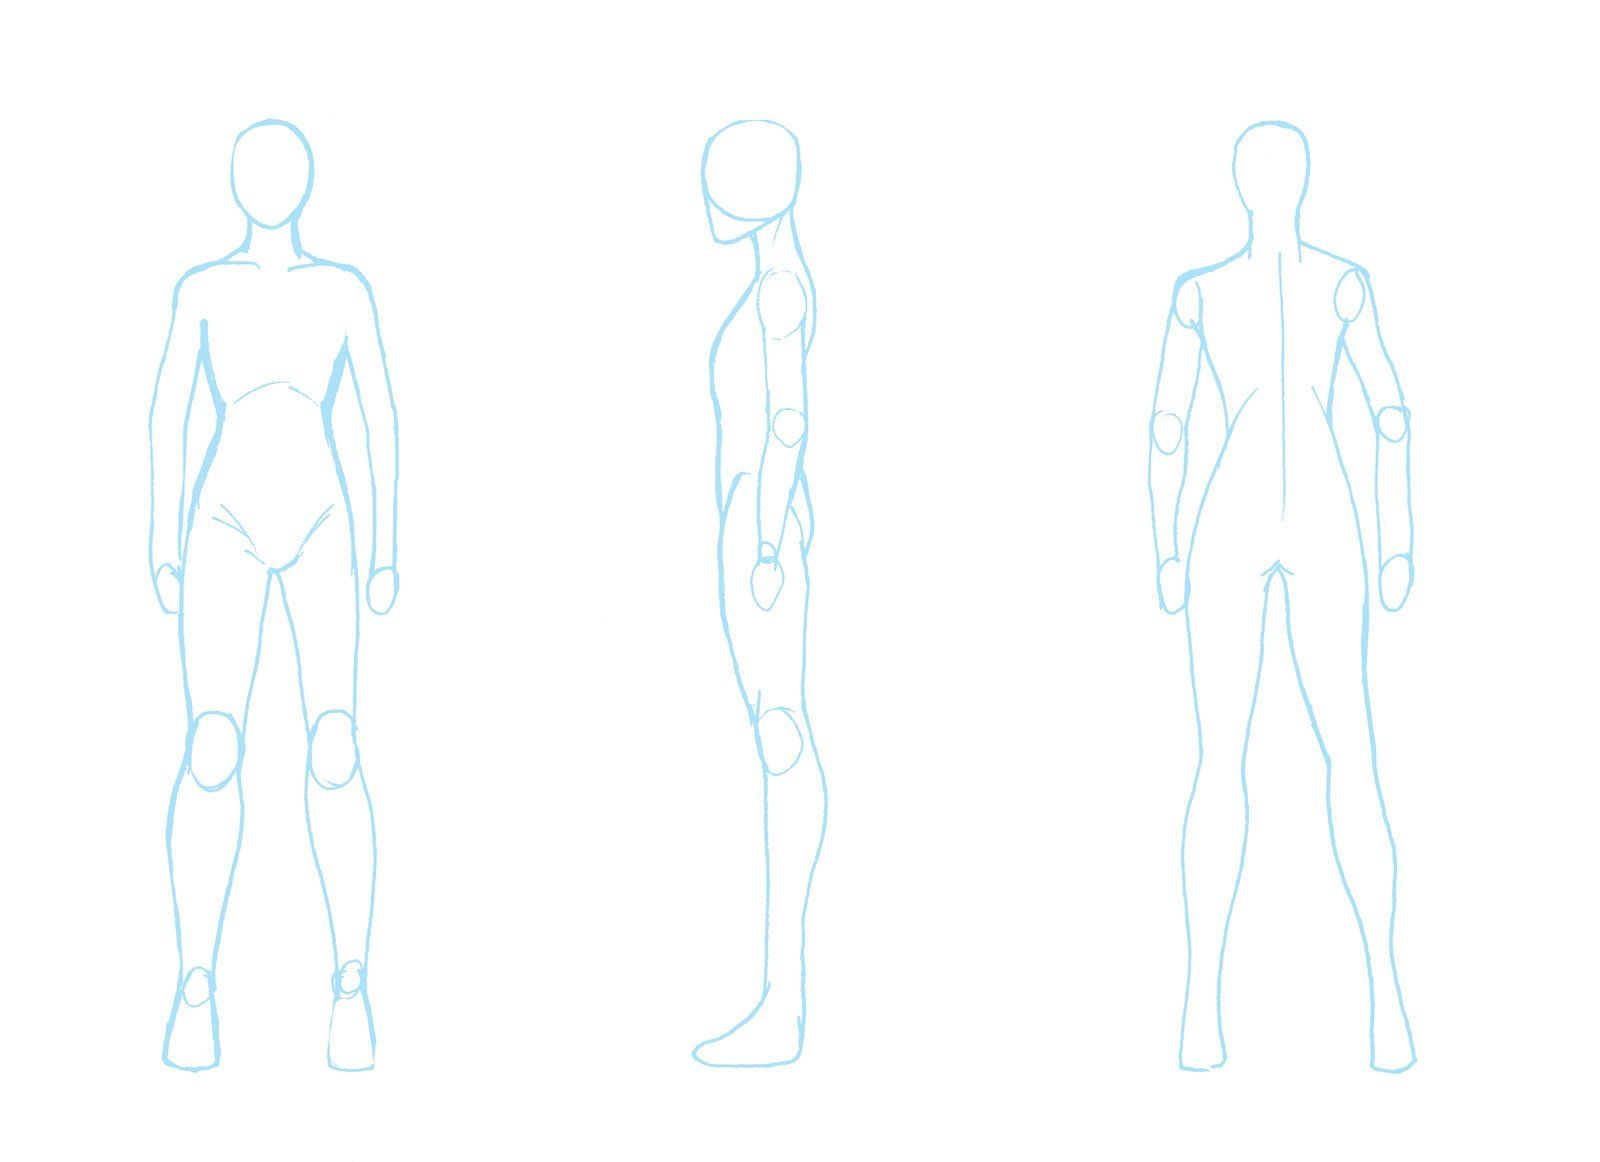 Character Design Outline : Body turnaround by zpansven on deviantart male